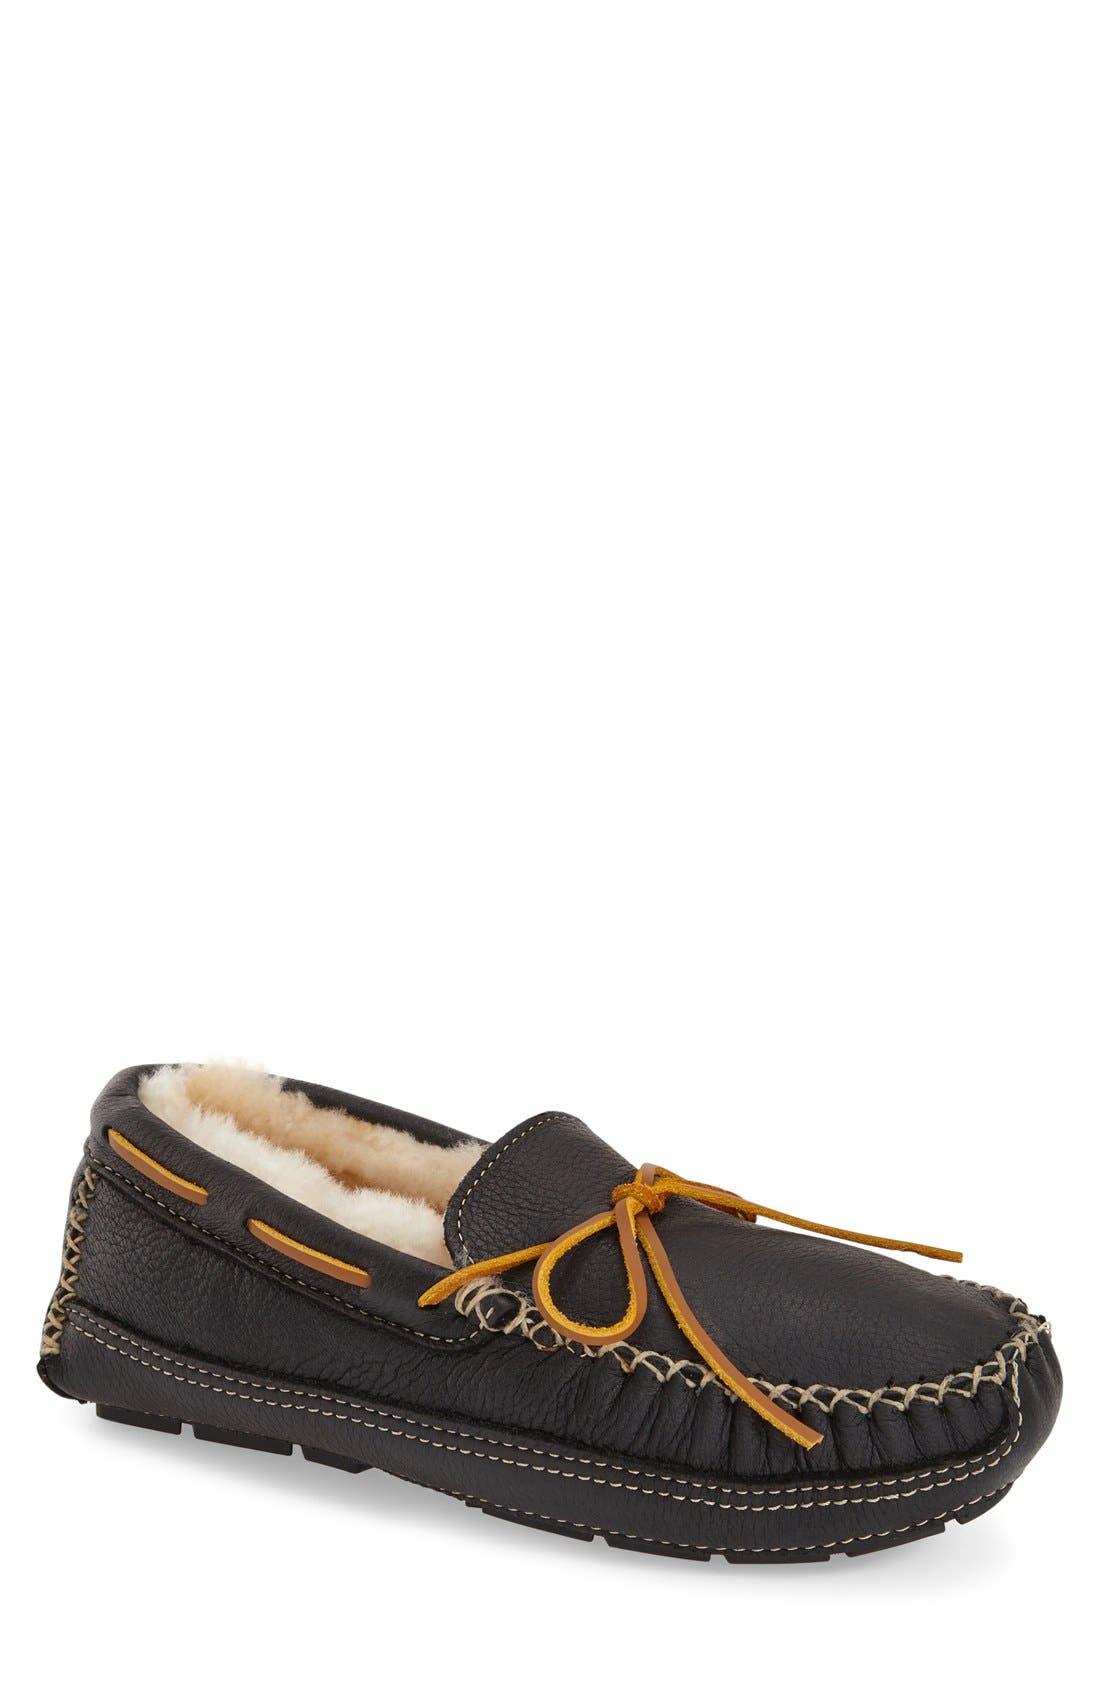 Genuine Shearling Leather Slipper,                         Main,                         color, Black